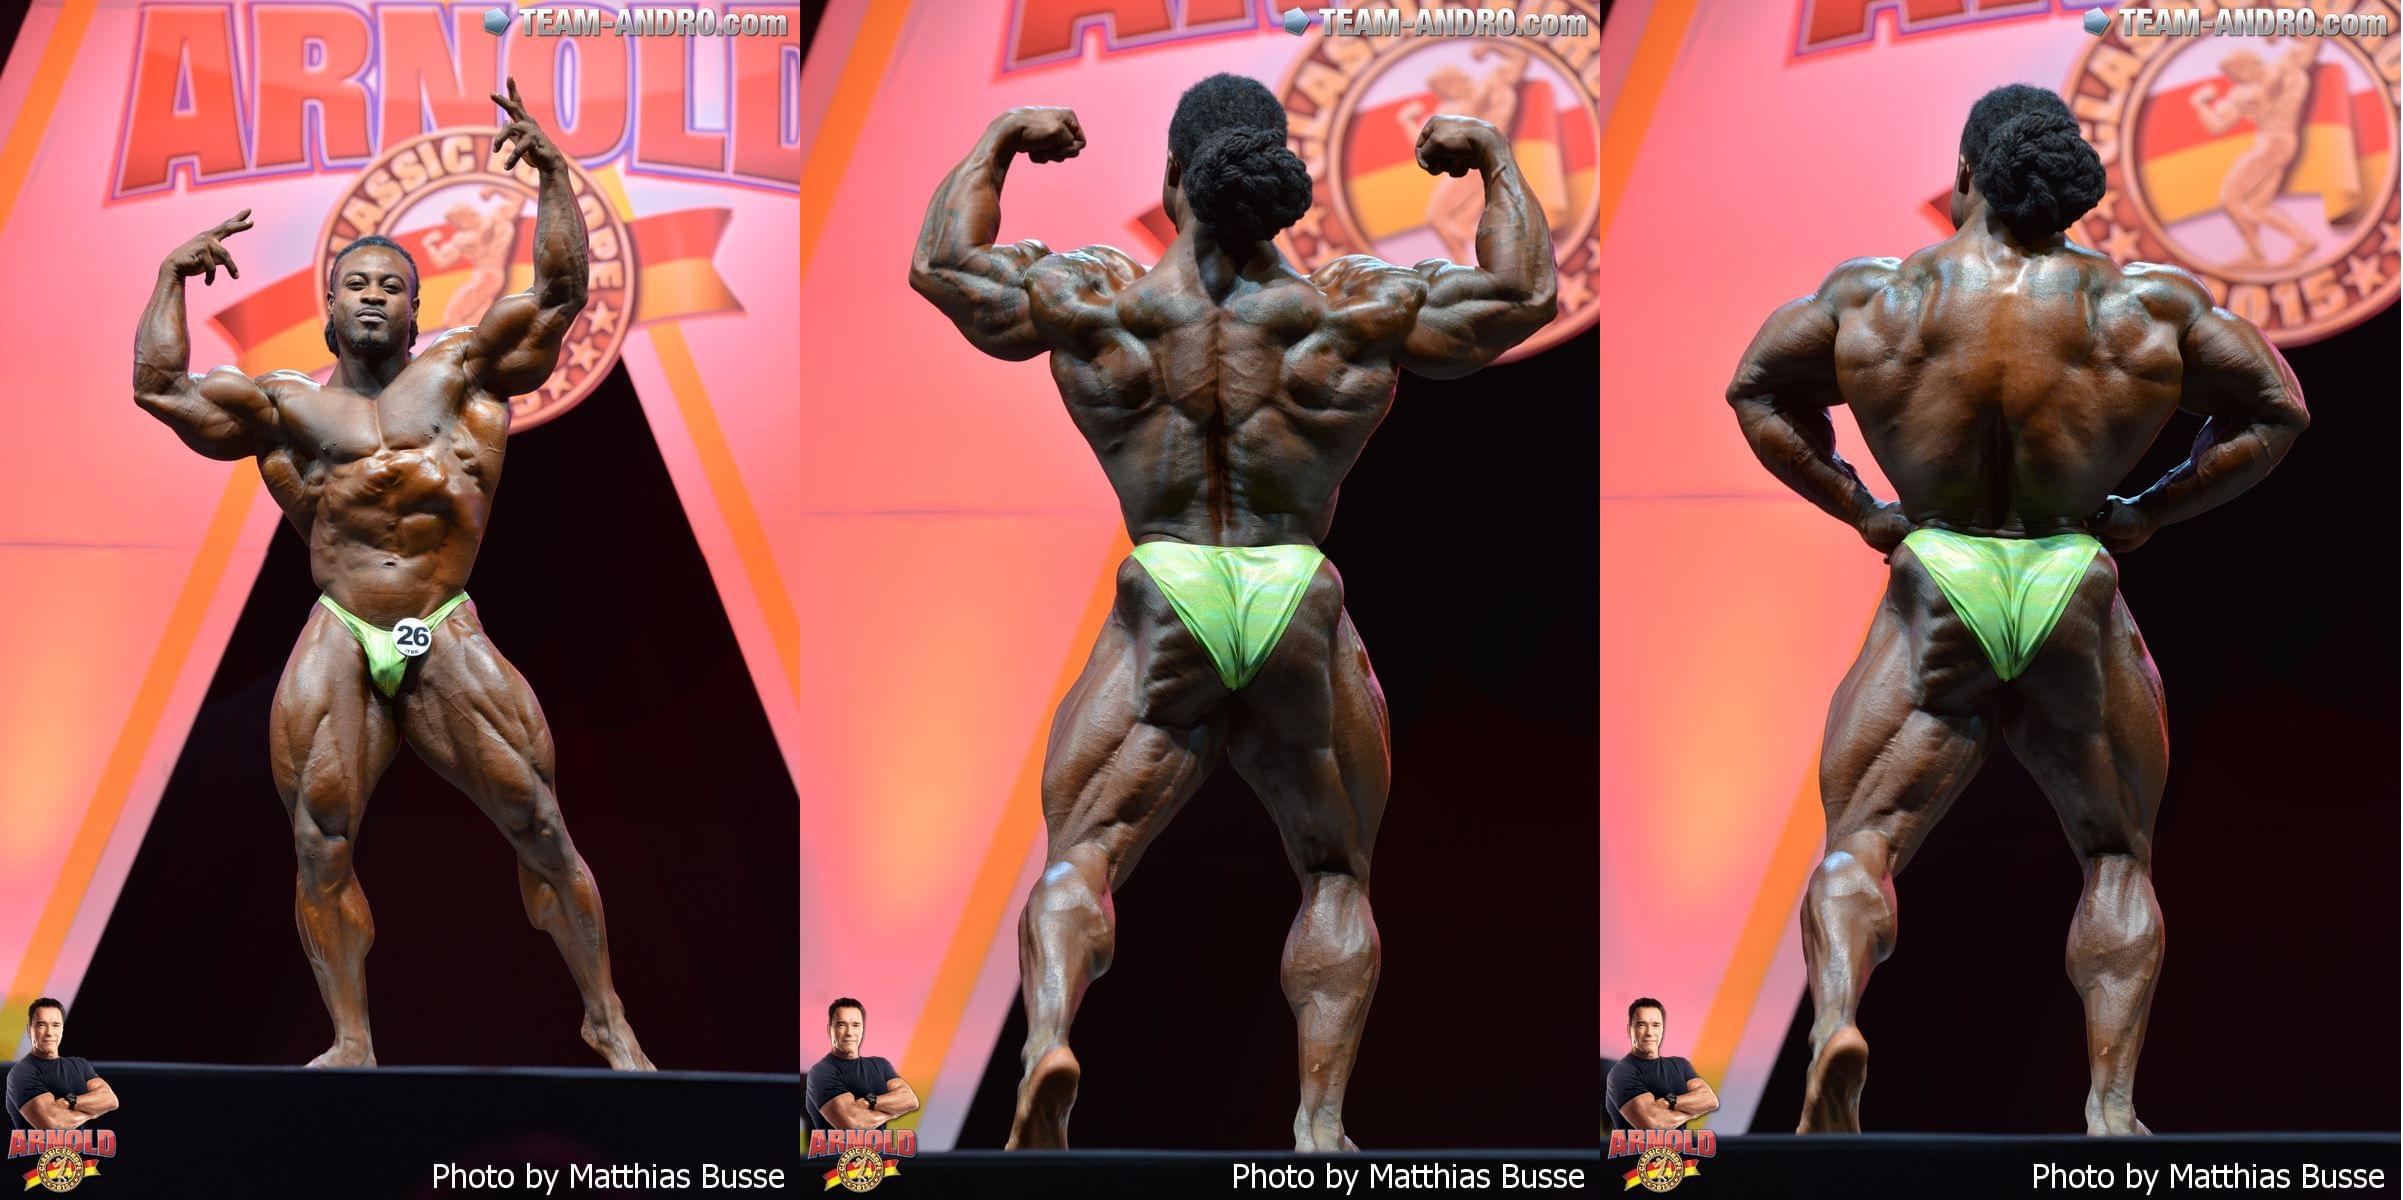 William Bonac (Netherlands) - 6 место